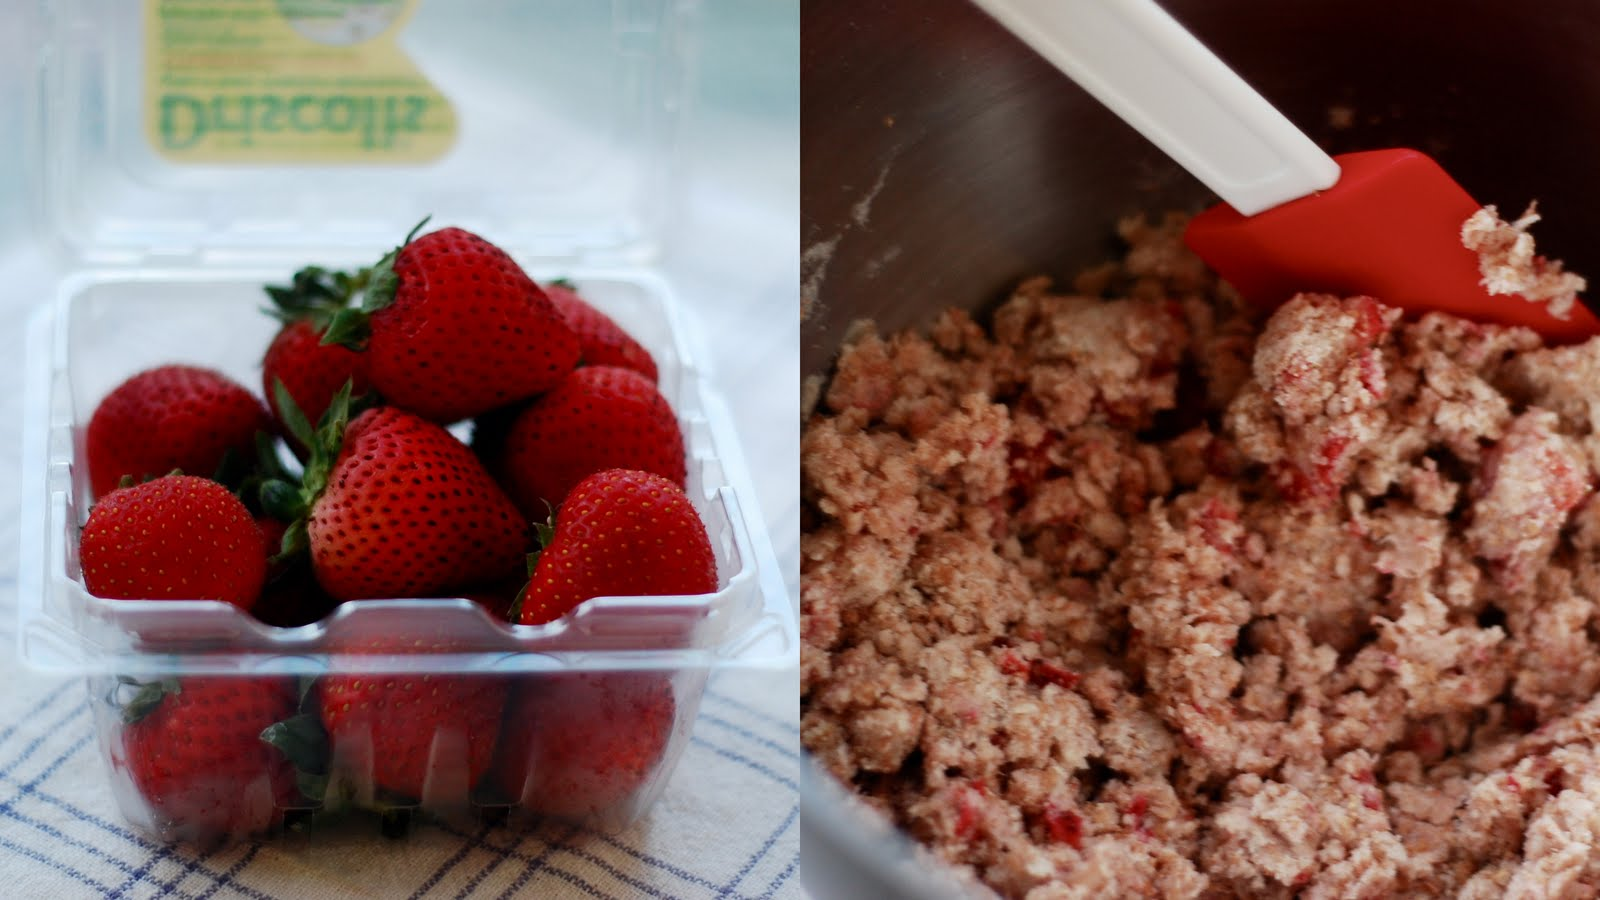 nodesserts: Strawberry, Ricotta and Yoghurt Scones